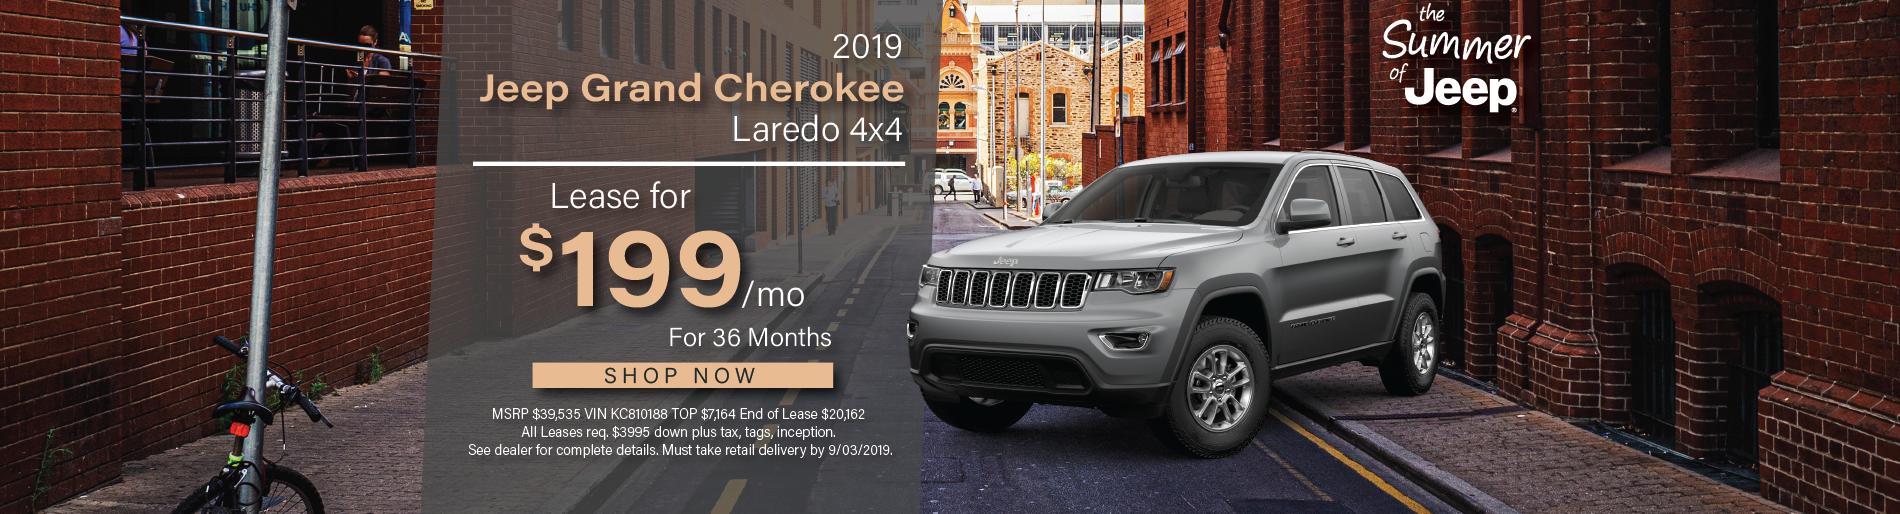 2019 Jeep Grand Cherokee | Lilliston Chrysler Dodge Jeep Ram